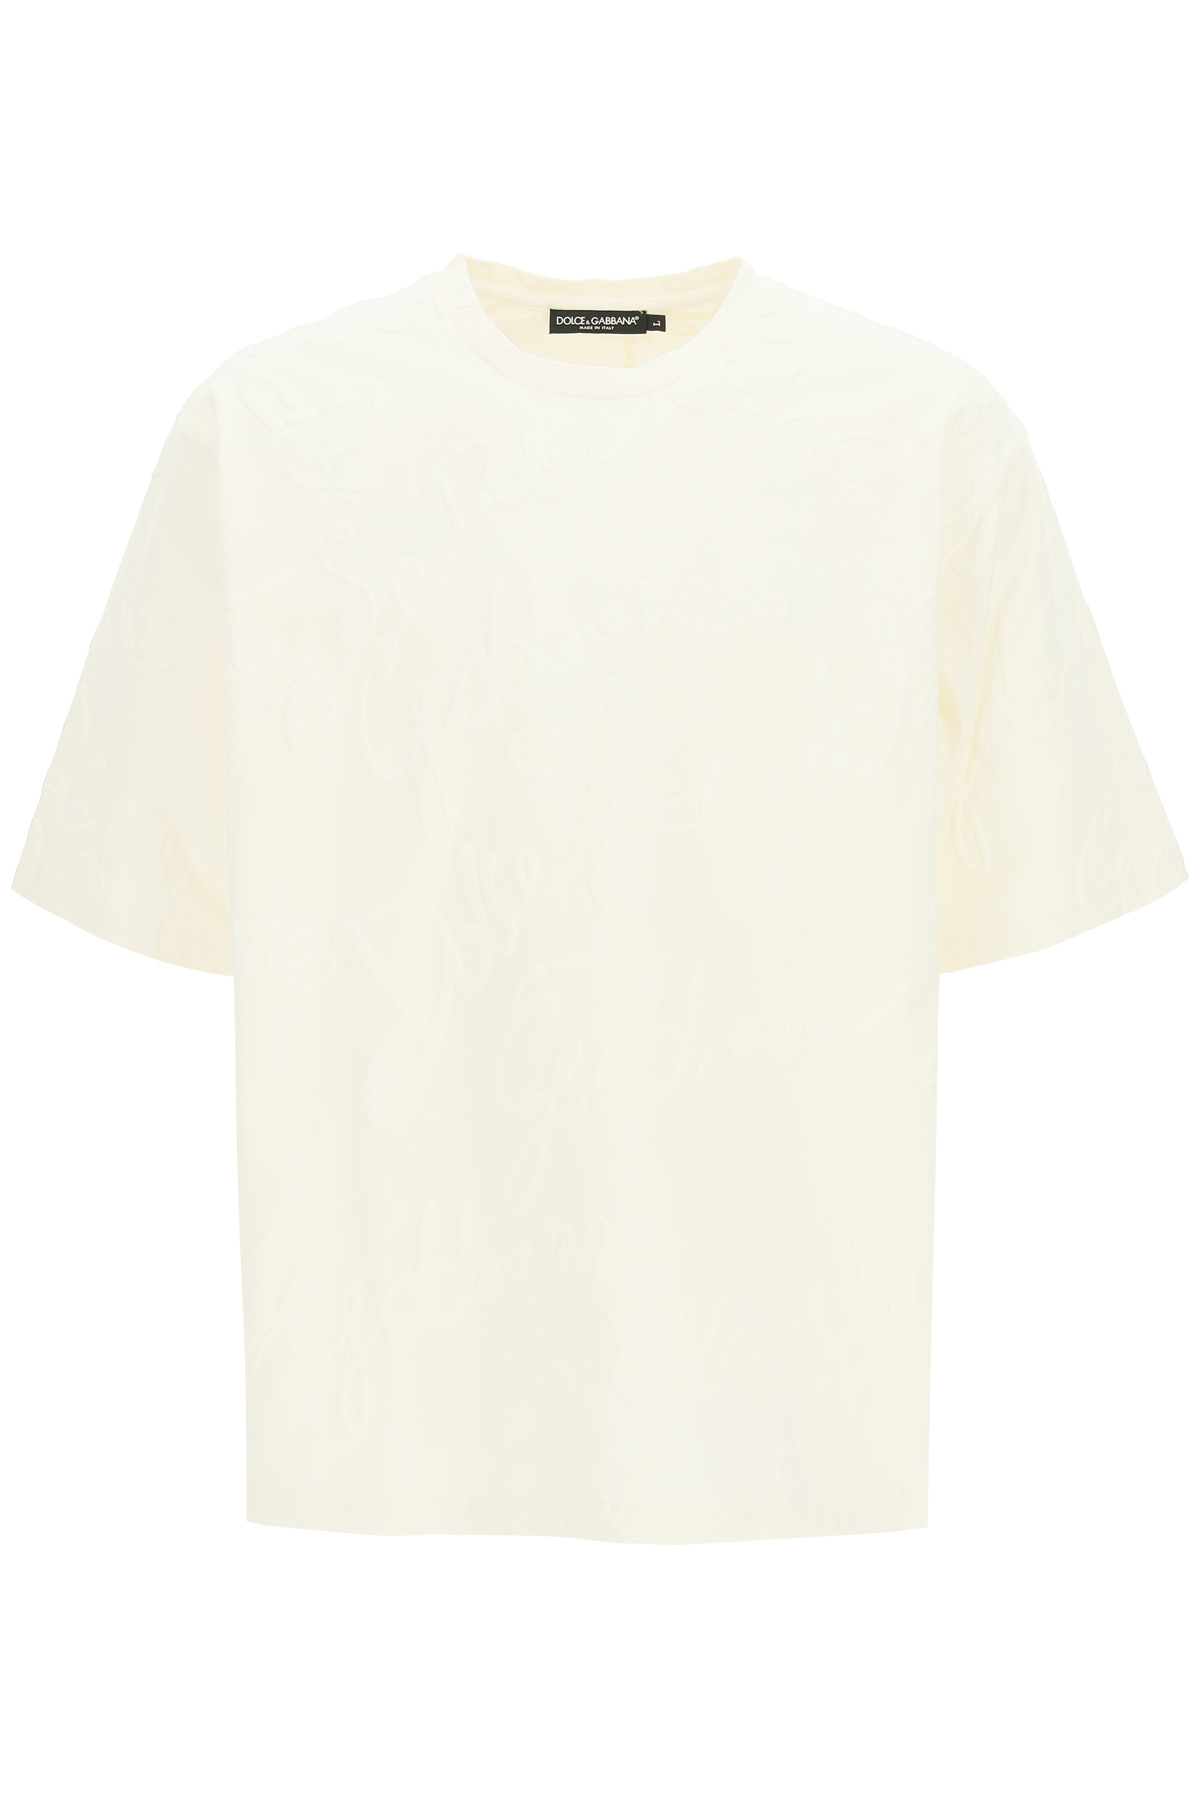 Dolce & gabbana t-shirt oversize con logo all-over